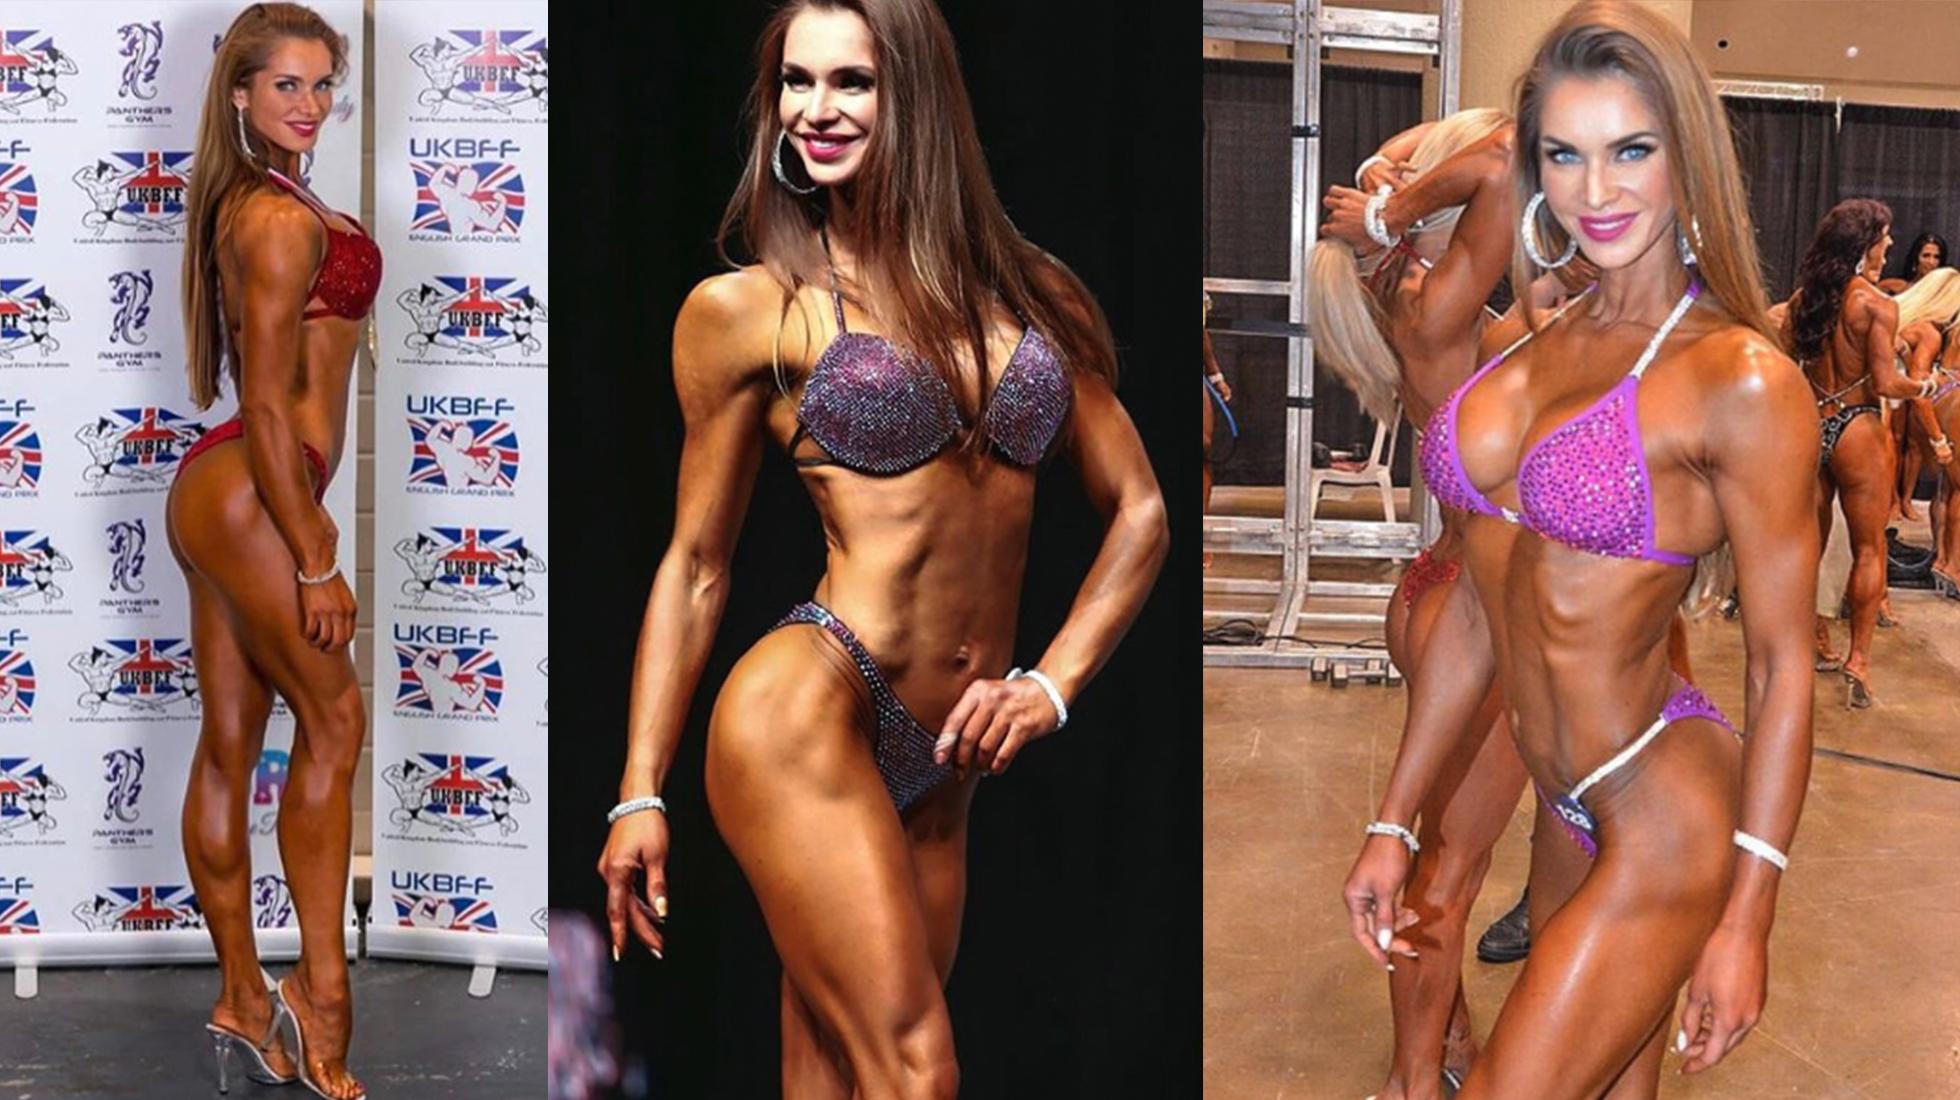 alla meijer ifbb bikini pro competitor posing coach uk londo anastasiaova anastasia ivanova.jpg